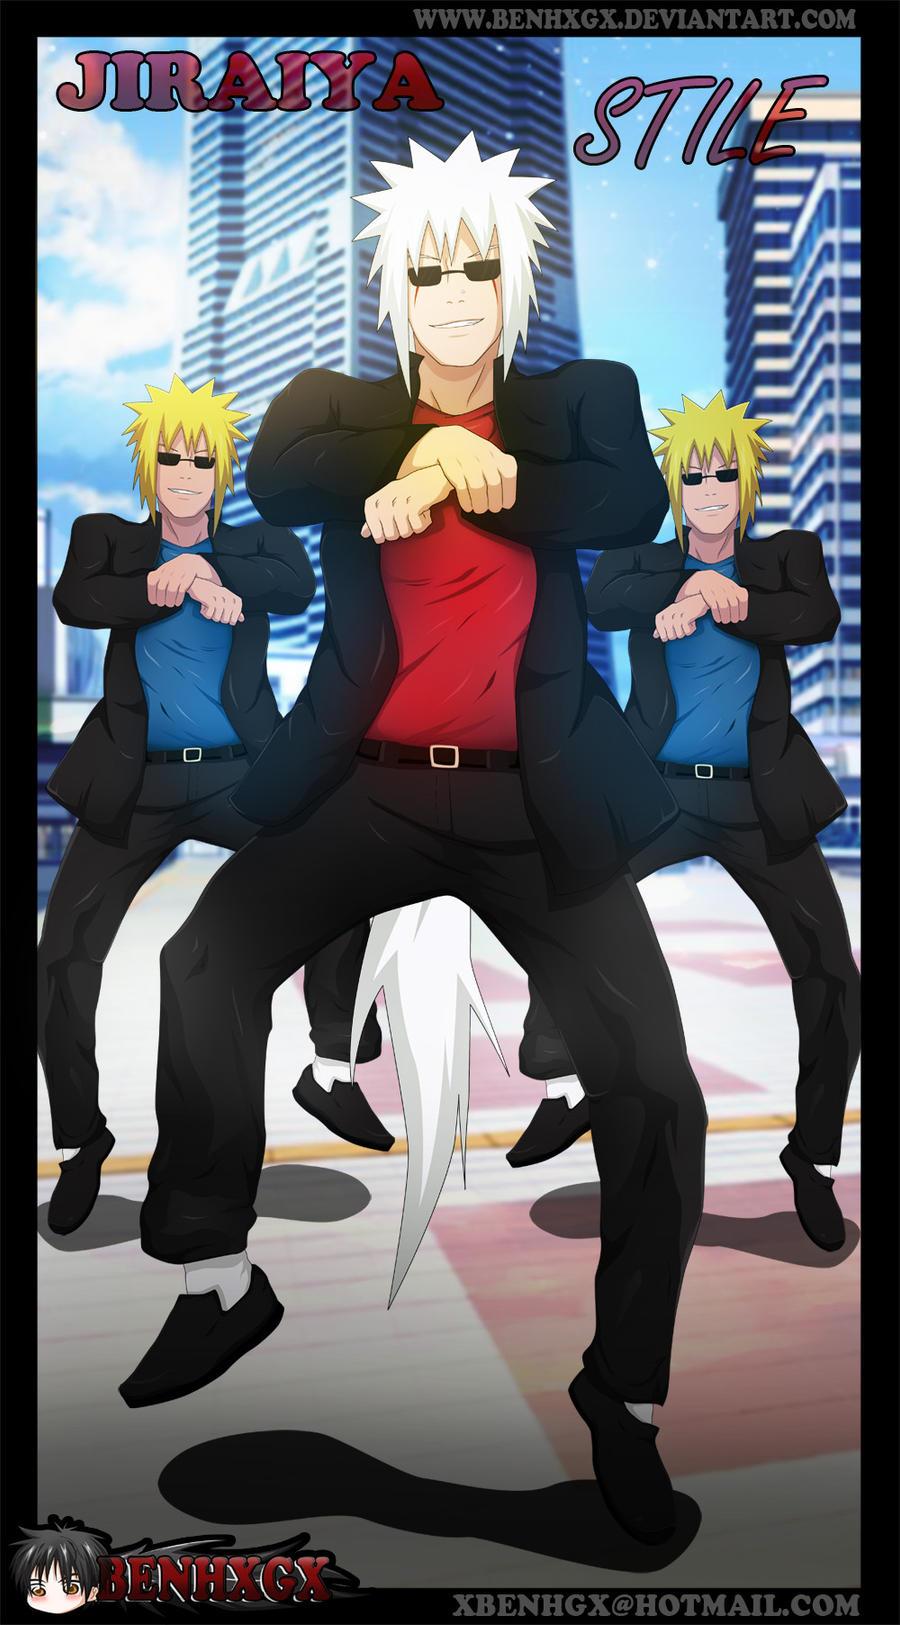 Jiraiya GanGnam Style by BENHXGX